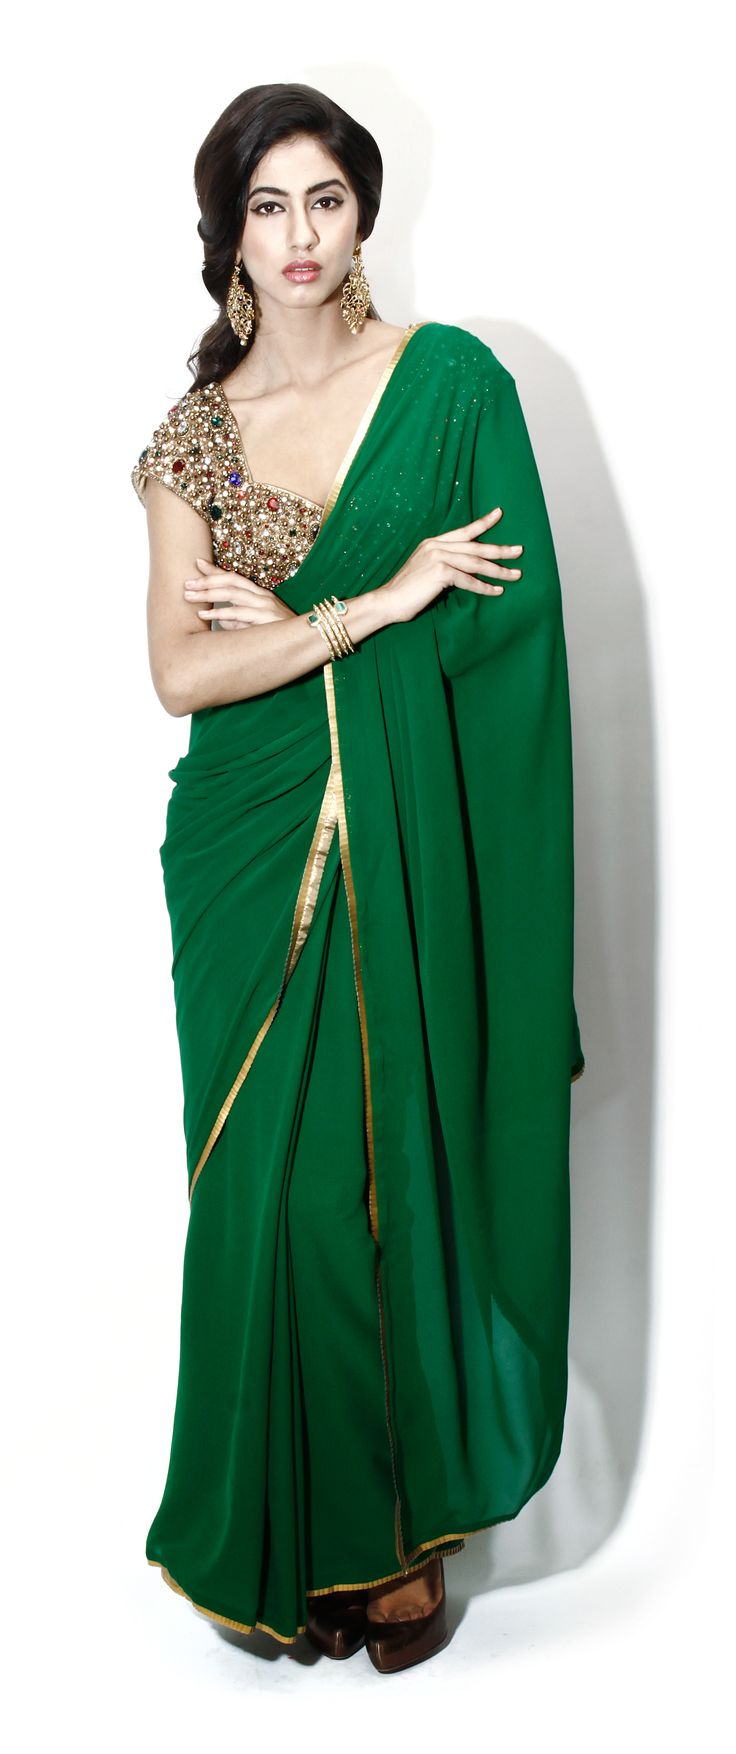 Green gota border sari by Seema Khan. #sari #shopnow #seemakhan #happyshopping